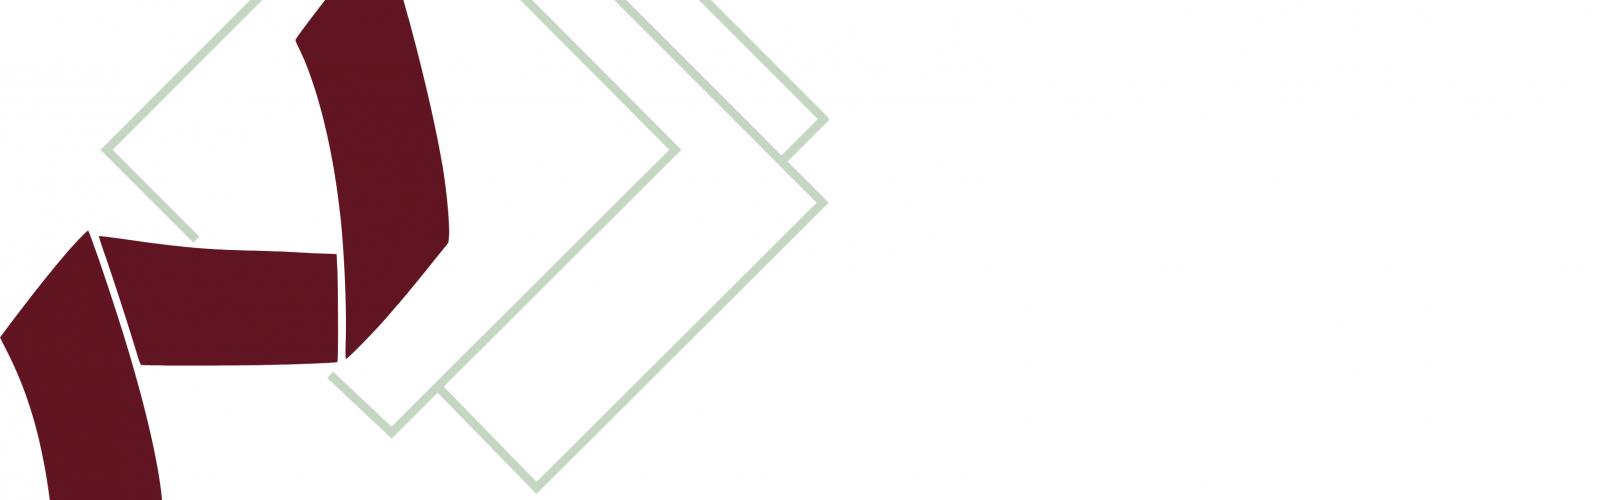 BMRB logo- R - Biological Magnetic Resonance Data Bank